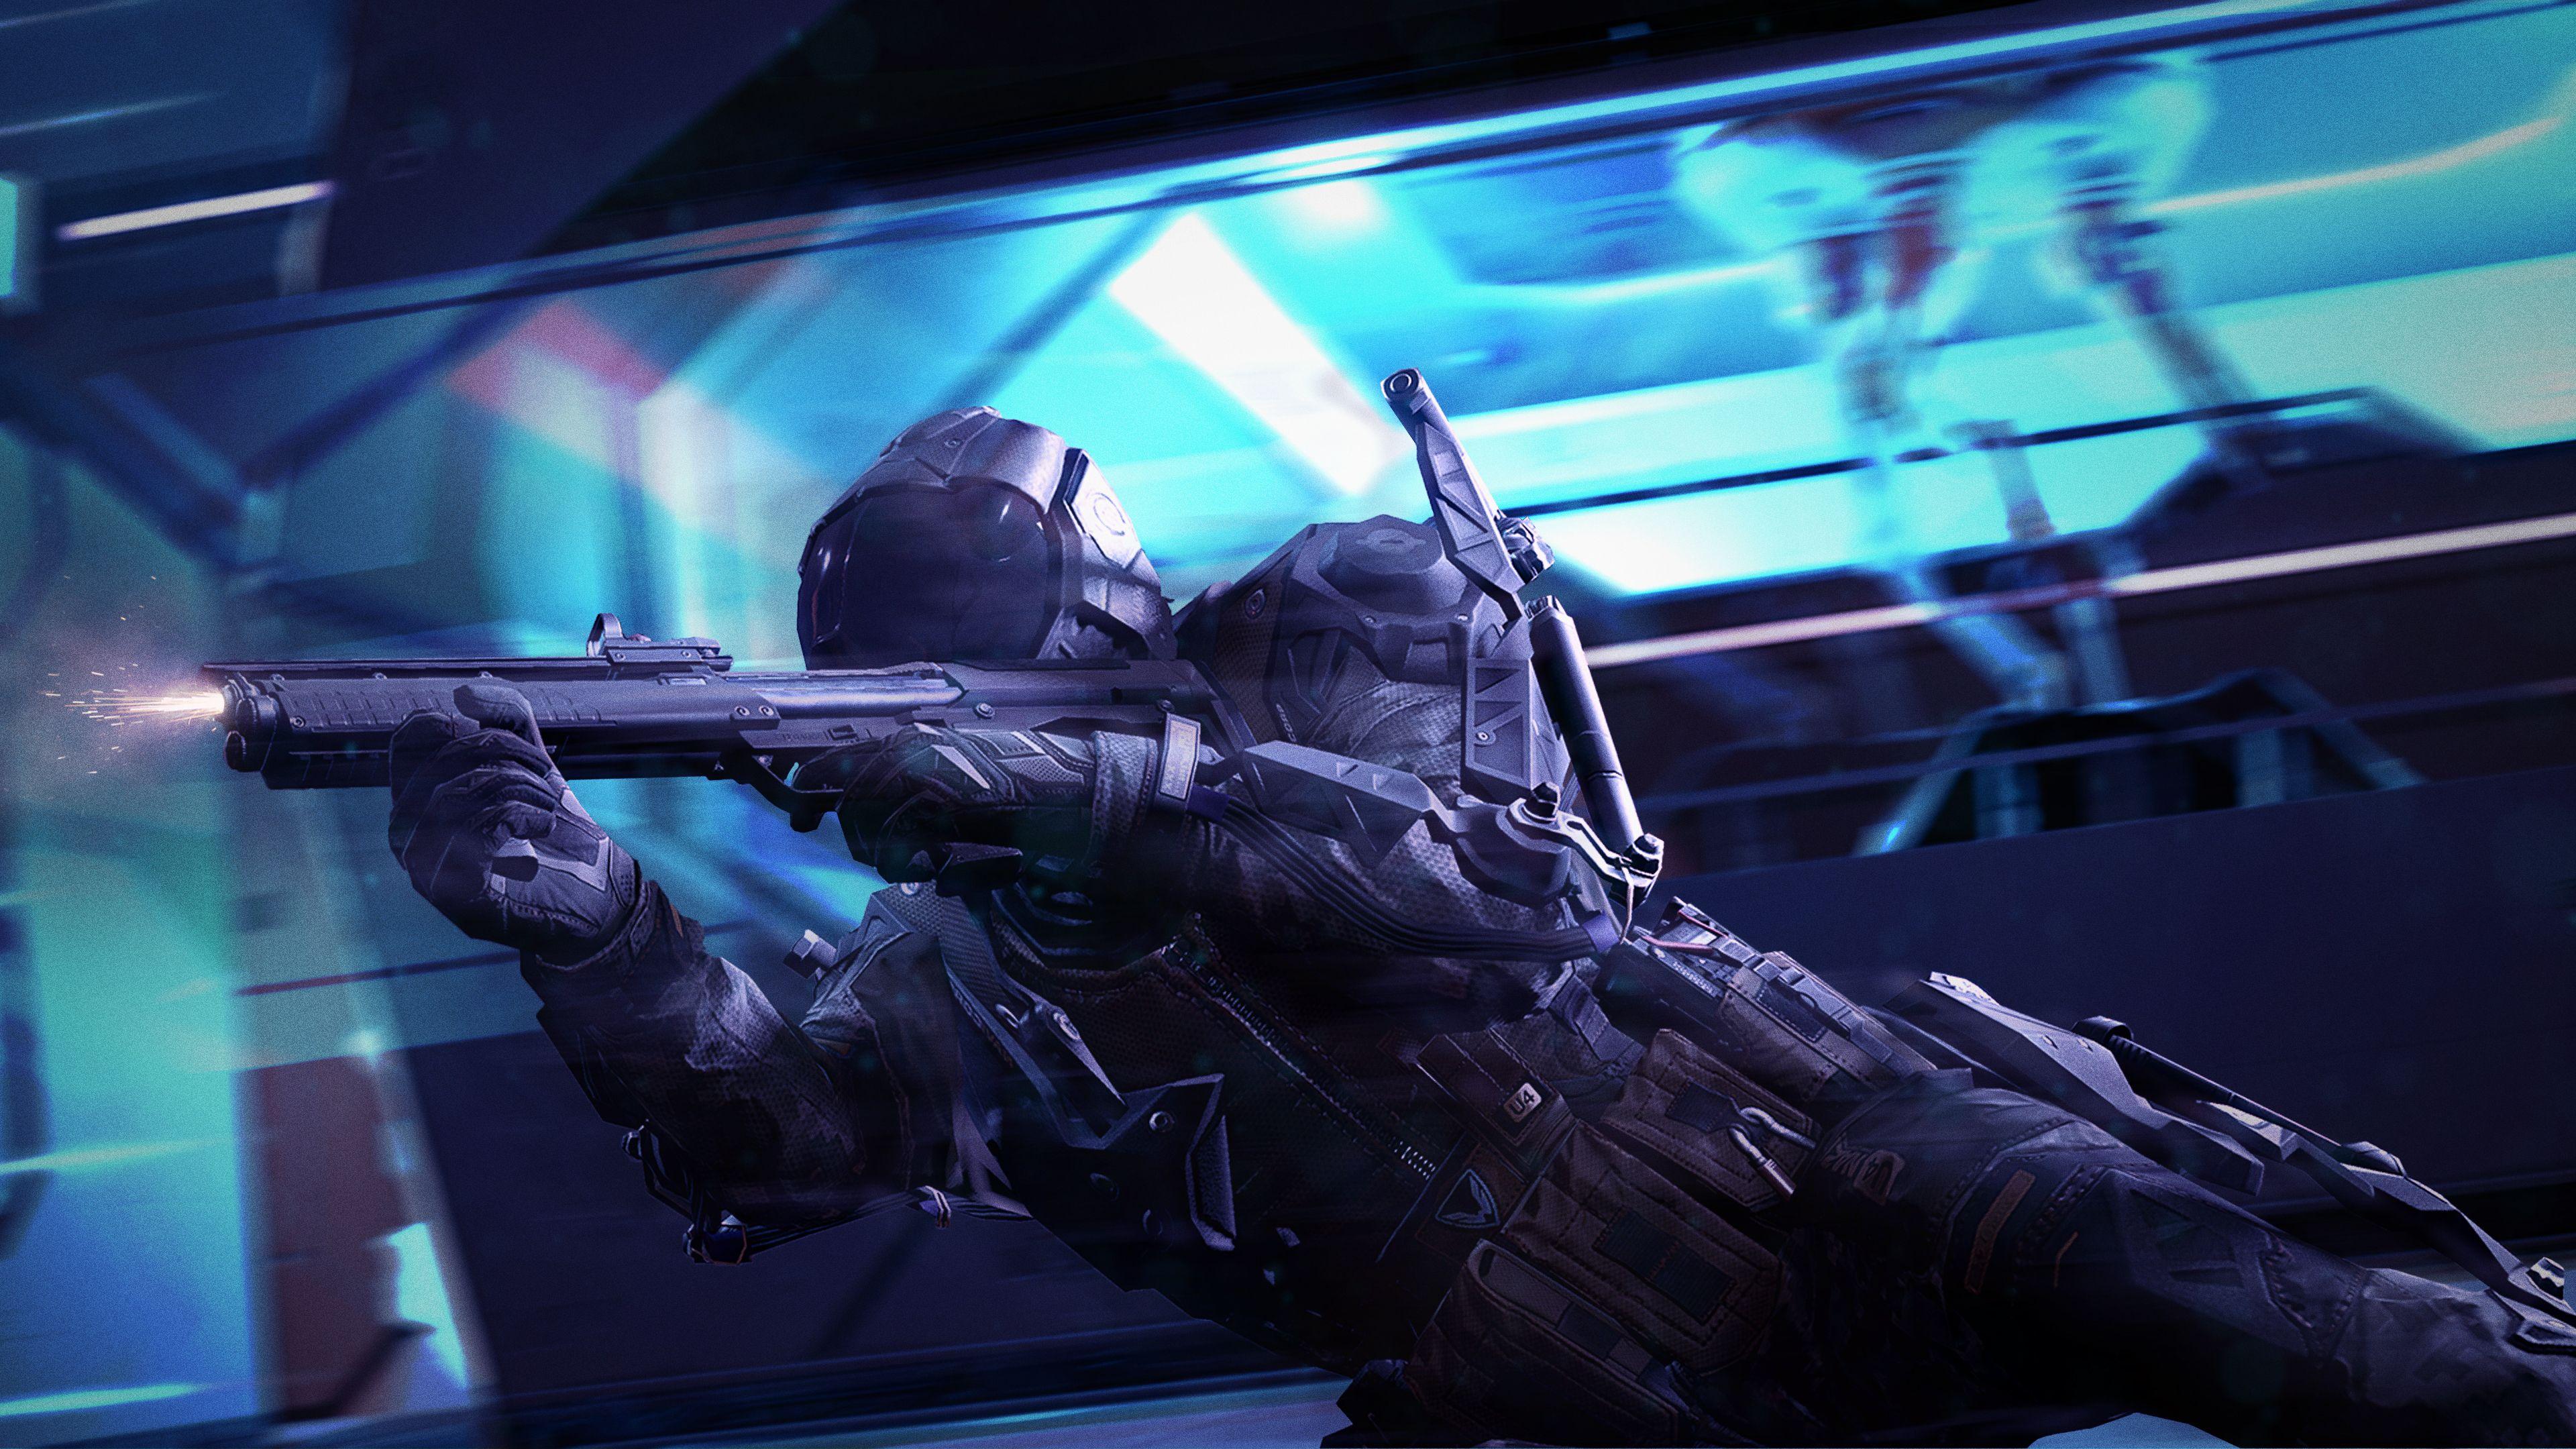 Crytek's online FPS Warface gets new Earthshaker co-op